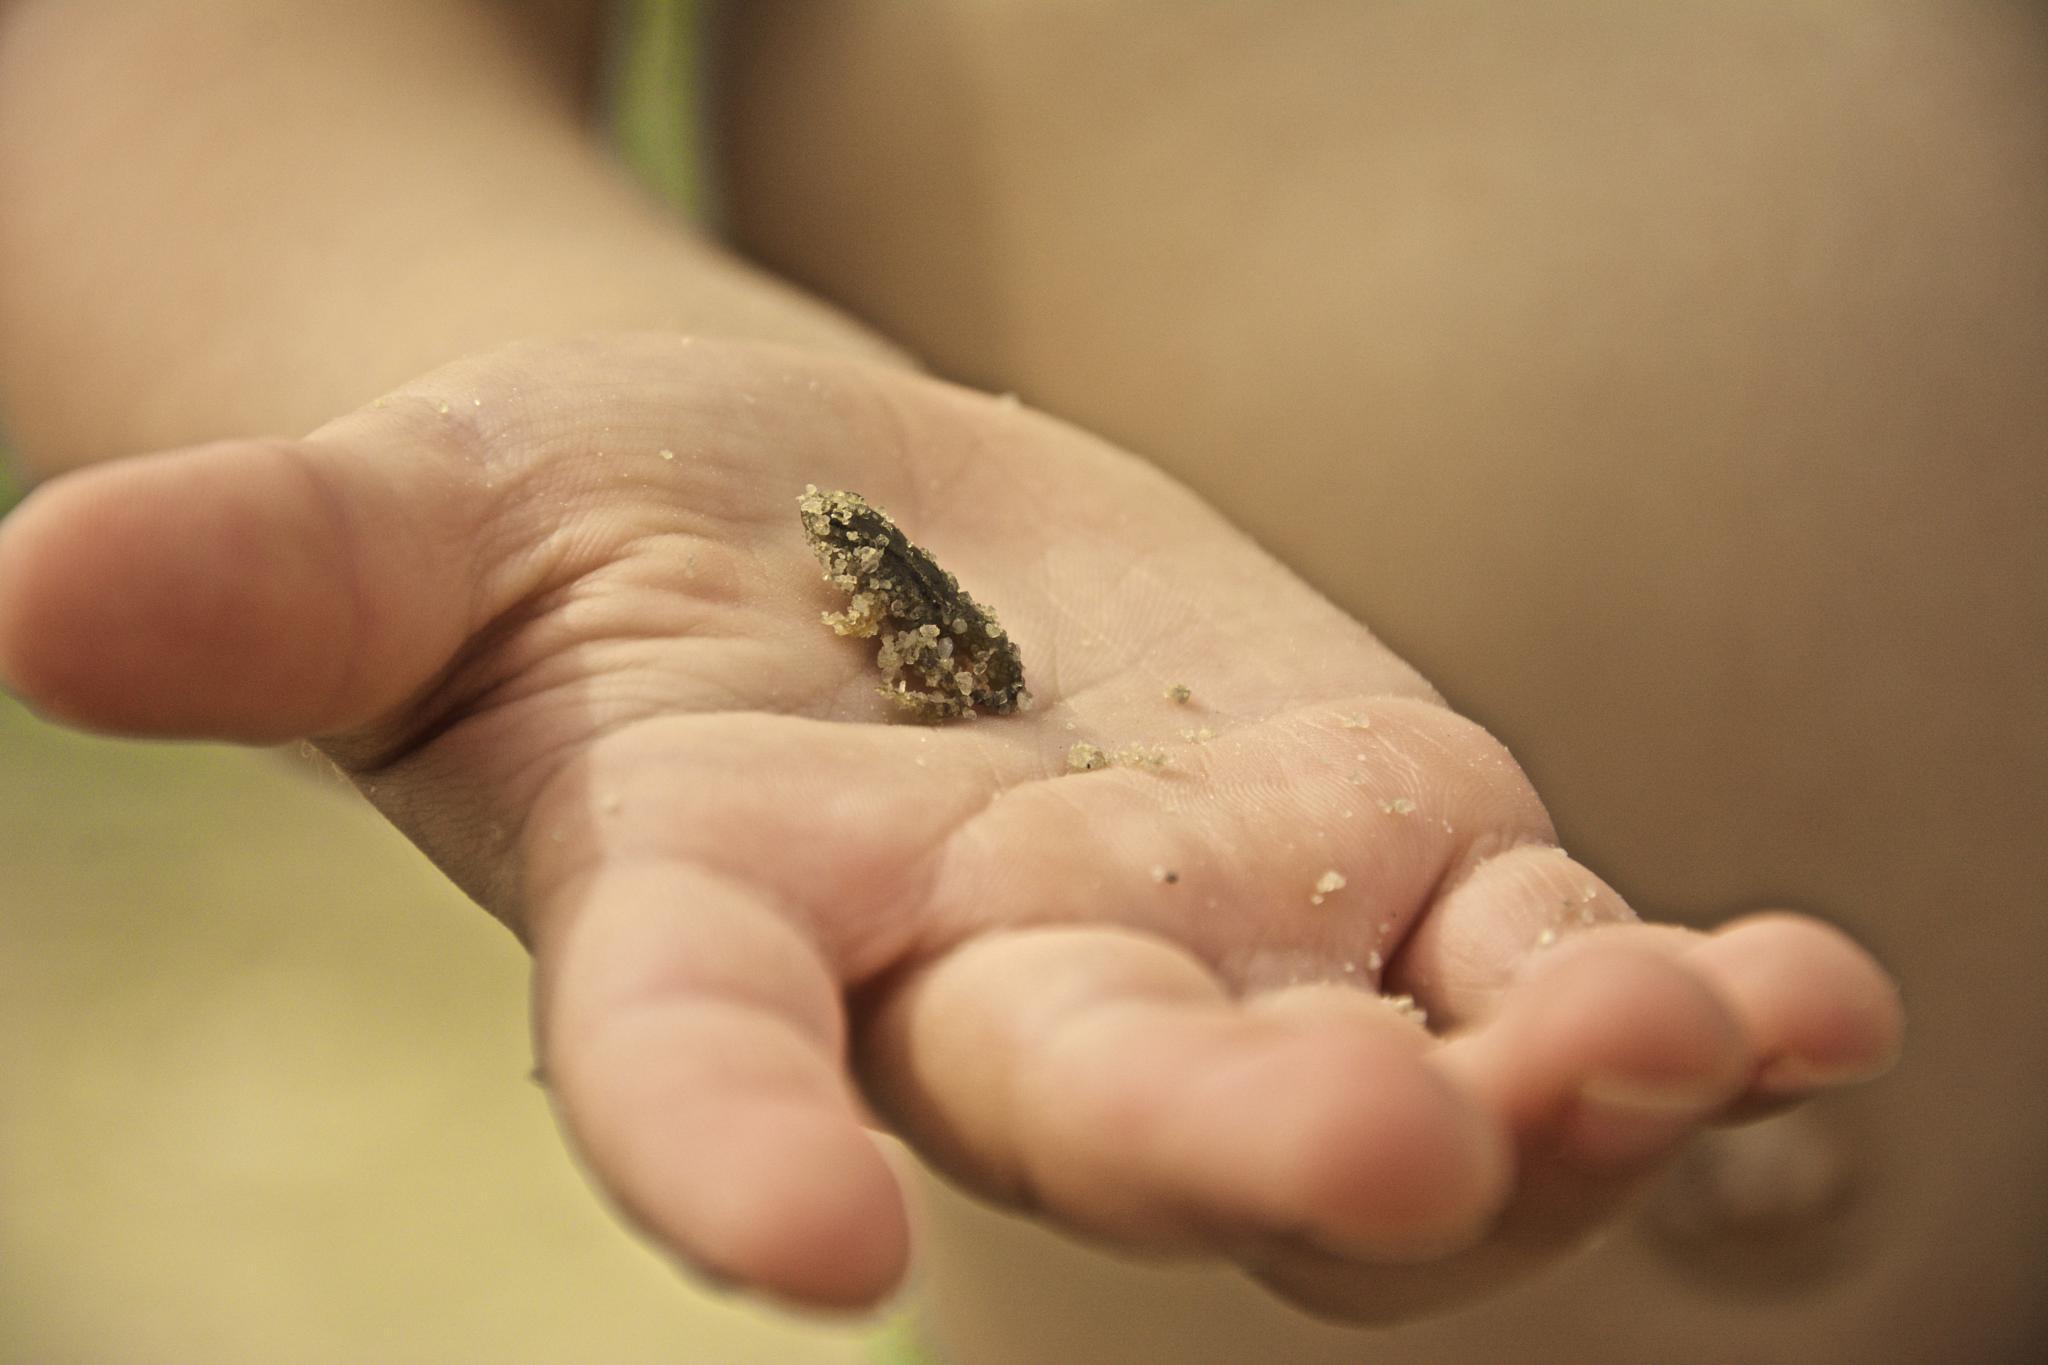 Tiny frog covered in sand  by TaraKiekt.nl